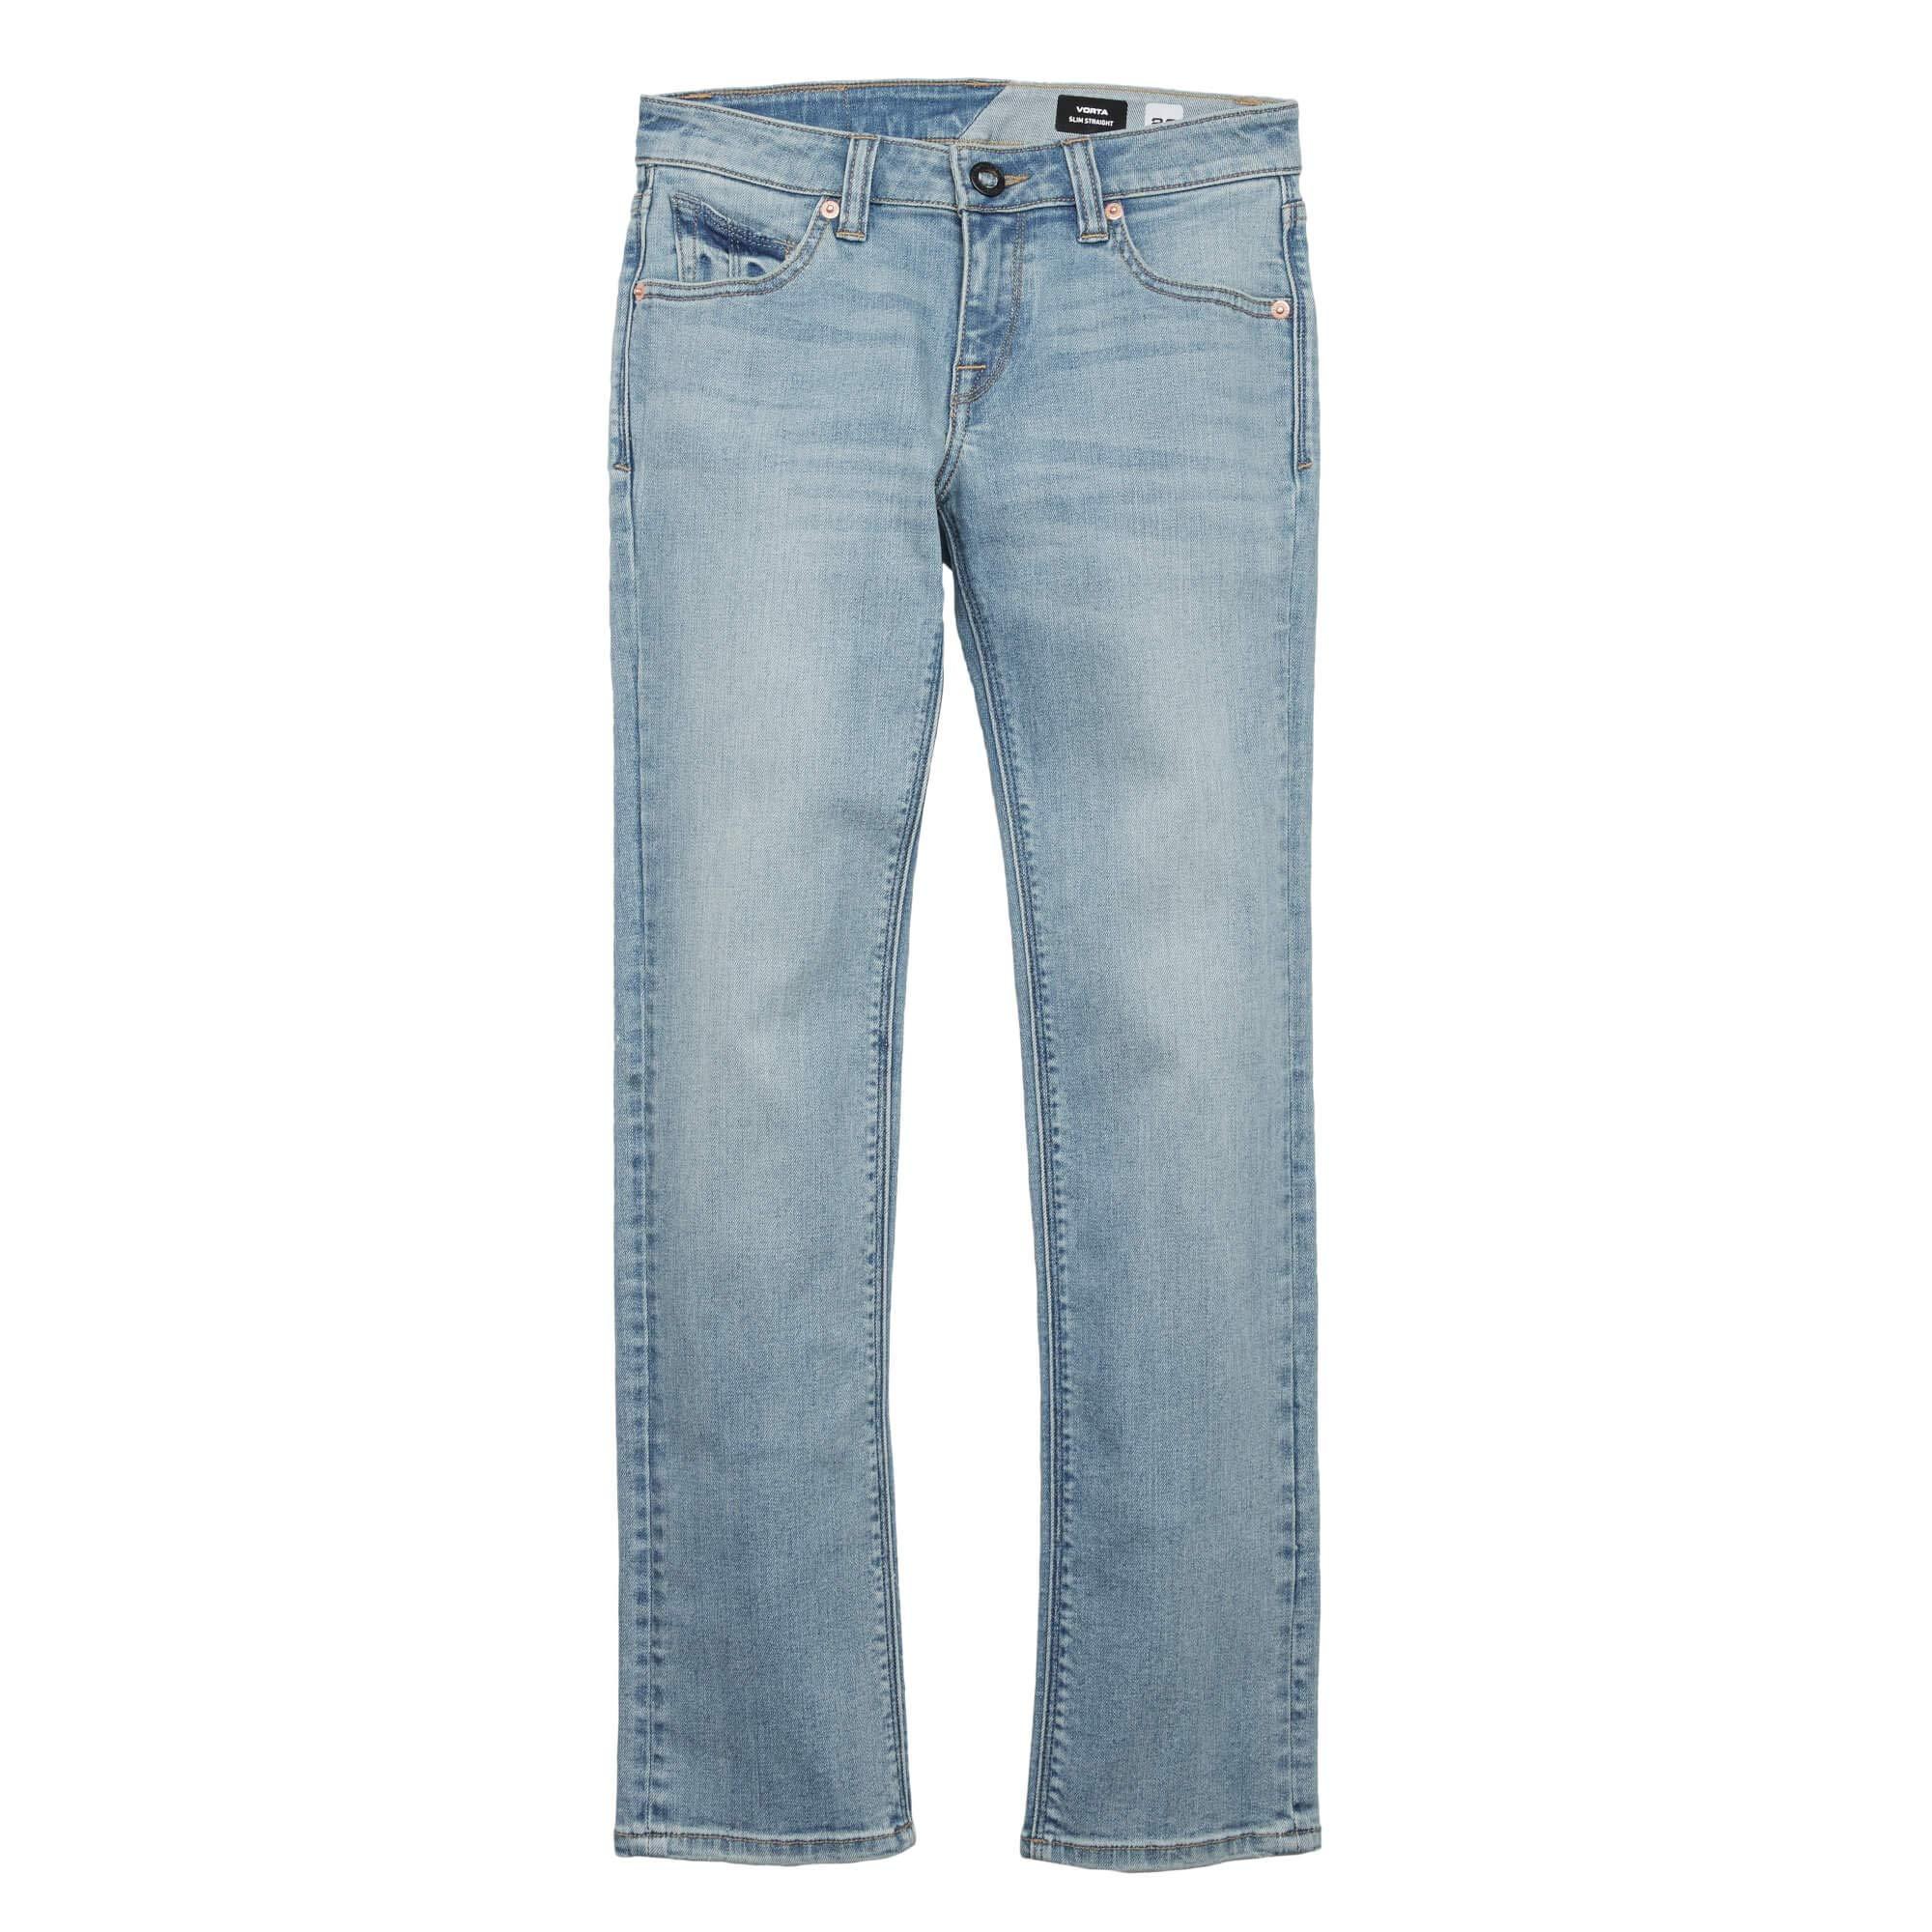 Volcom Big Boys Vorta Denim Jeans, Allover Stone Light, 25